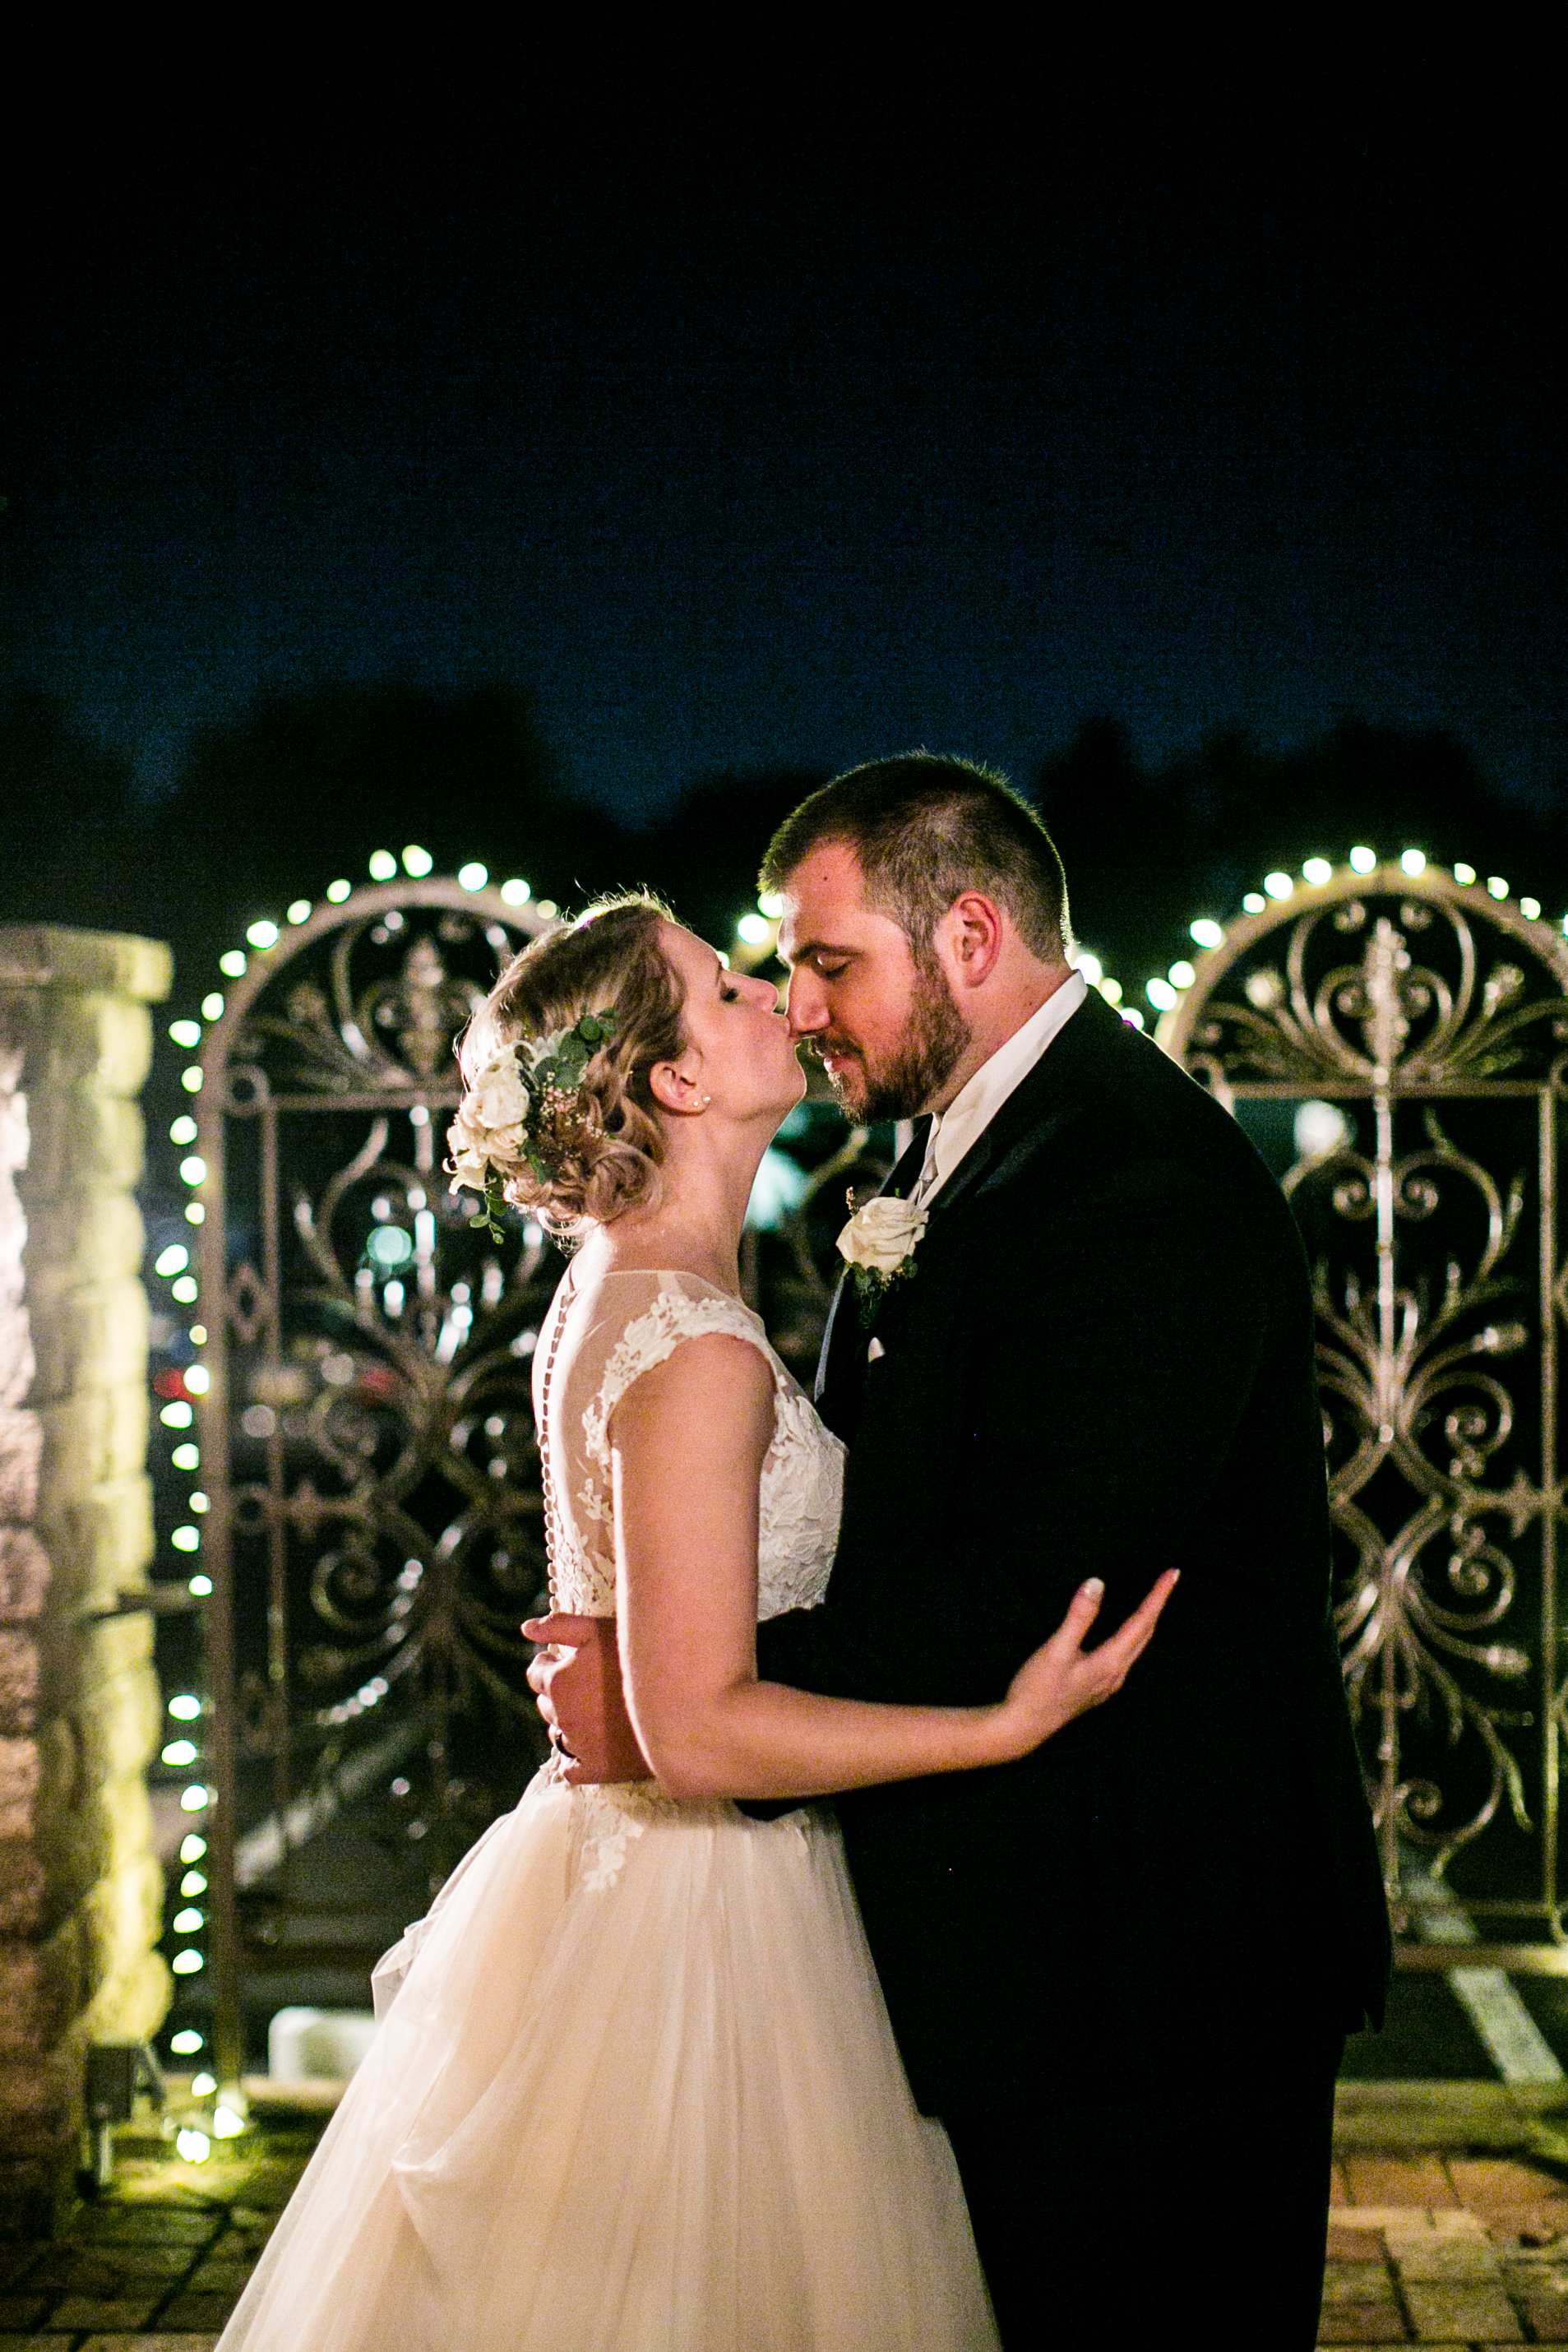 LA LUNA BANQUET HALL WEDDING BENSALEM - 112.jpg